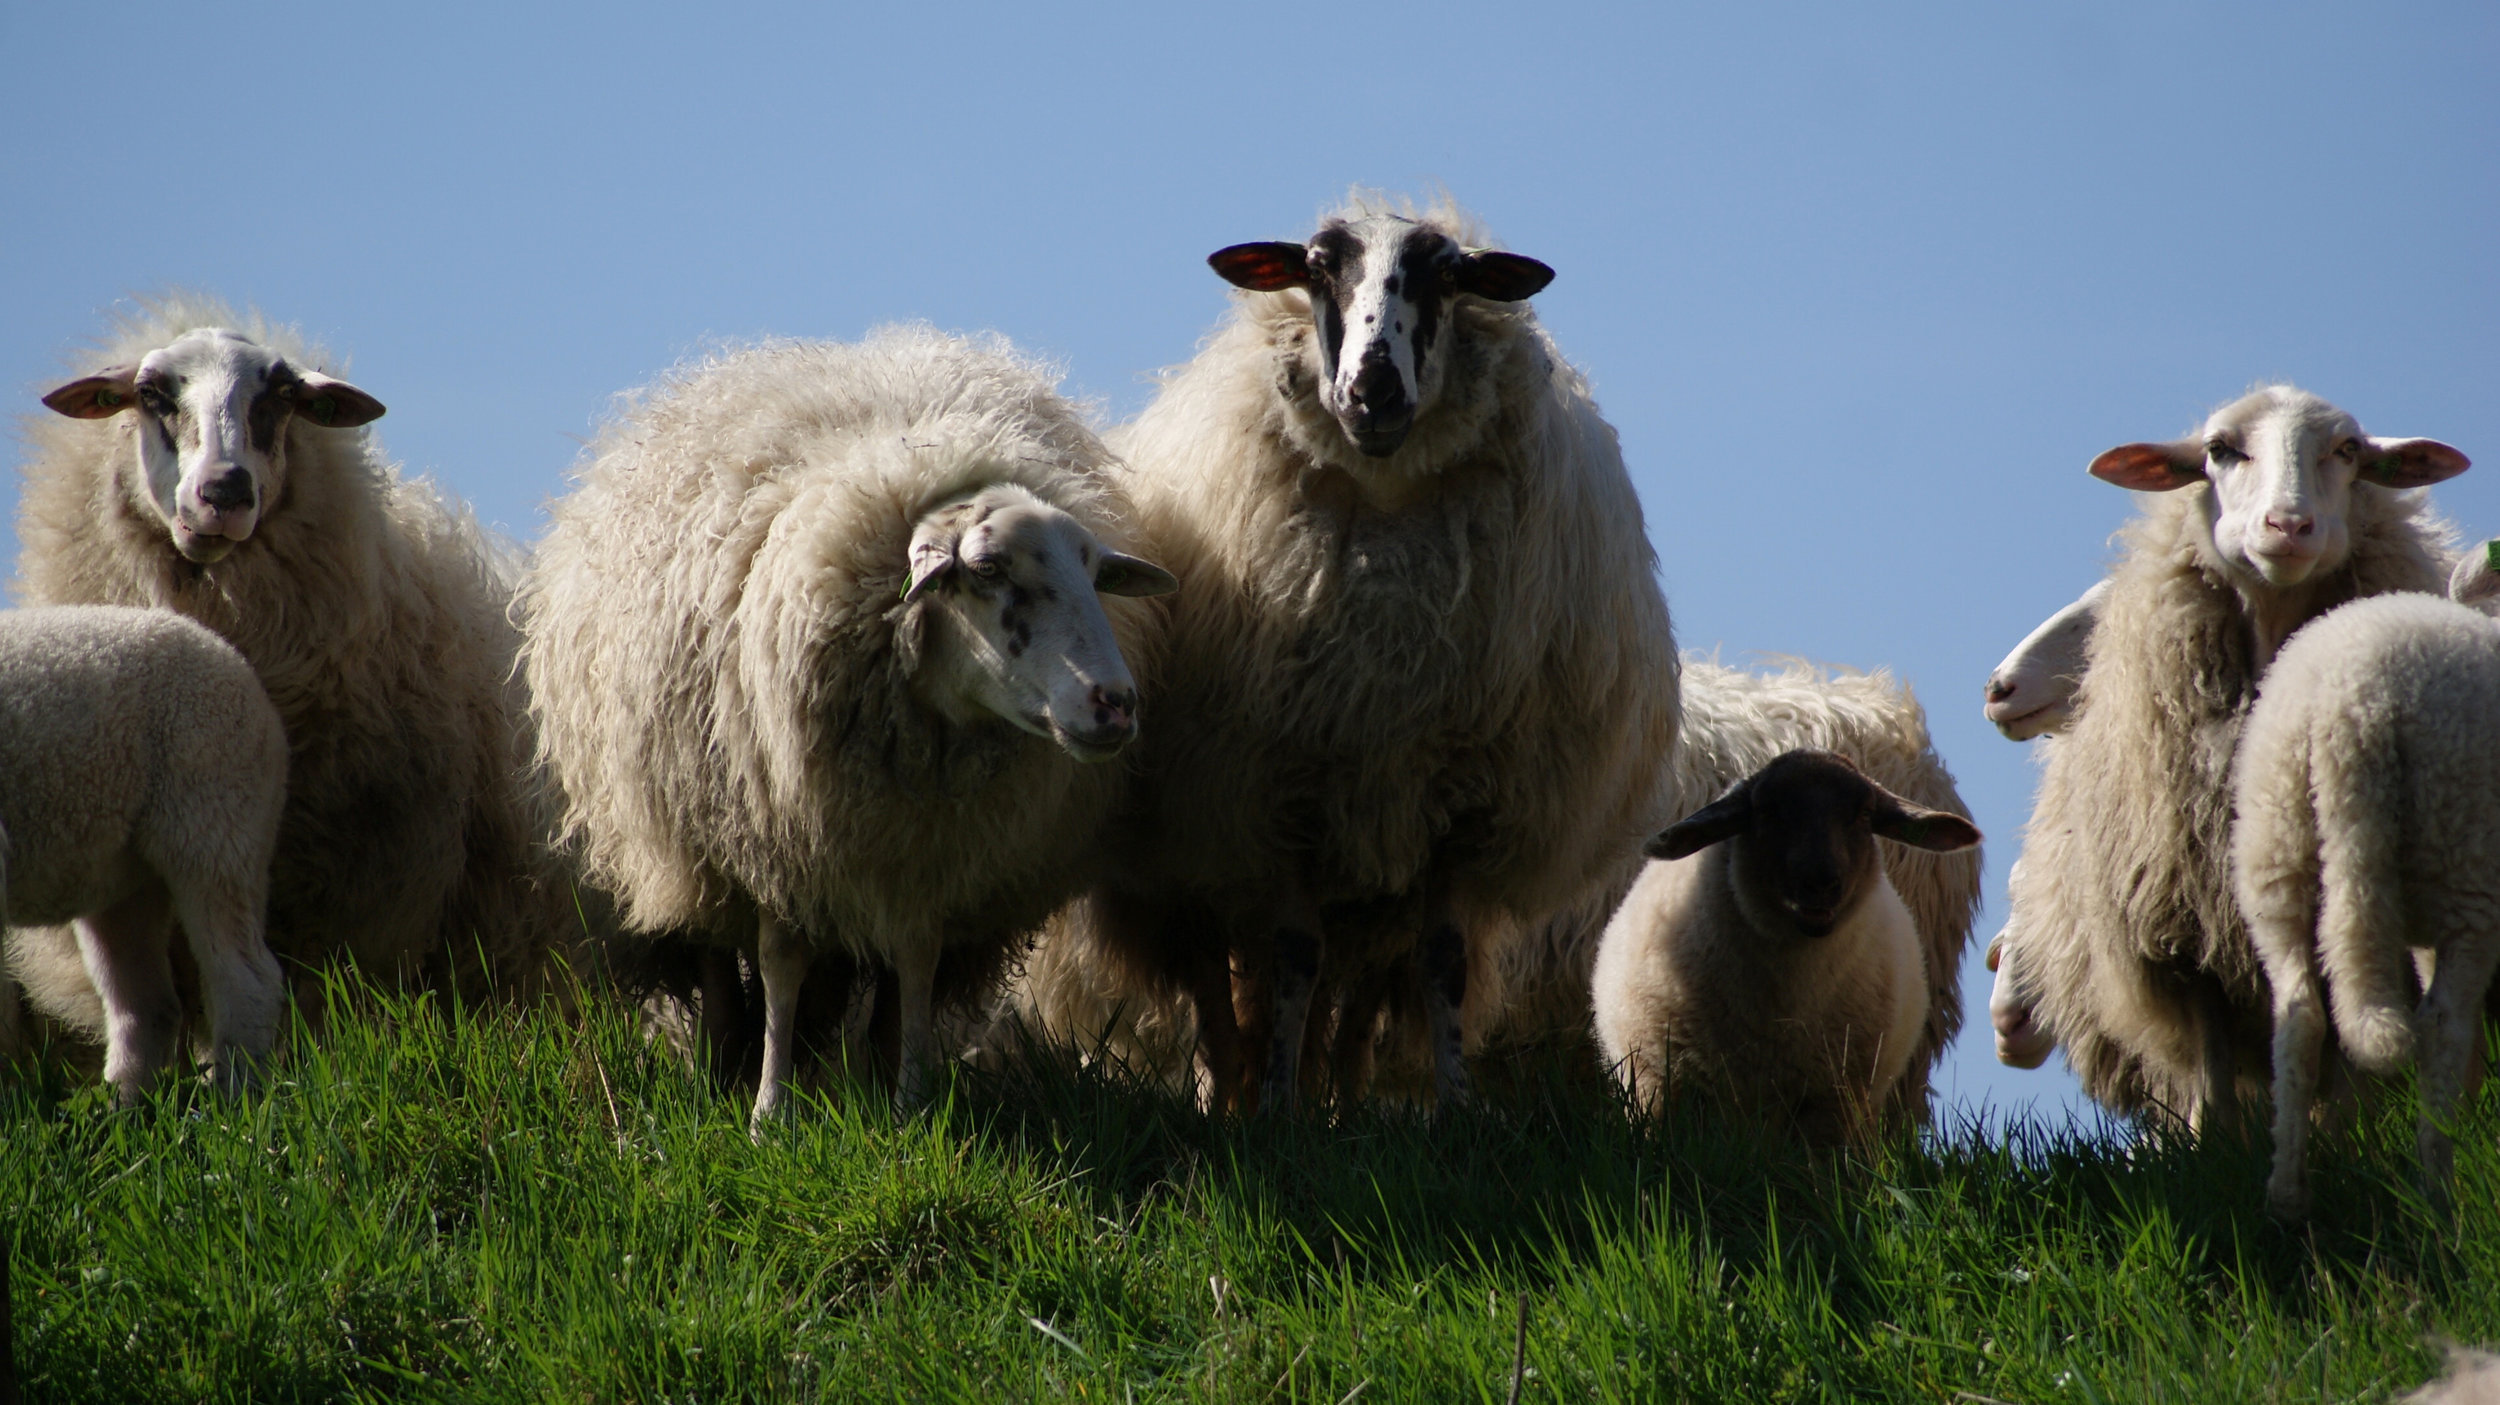 meadow-animals-sheep-wool.jpg